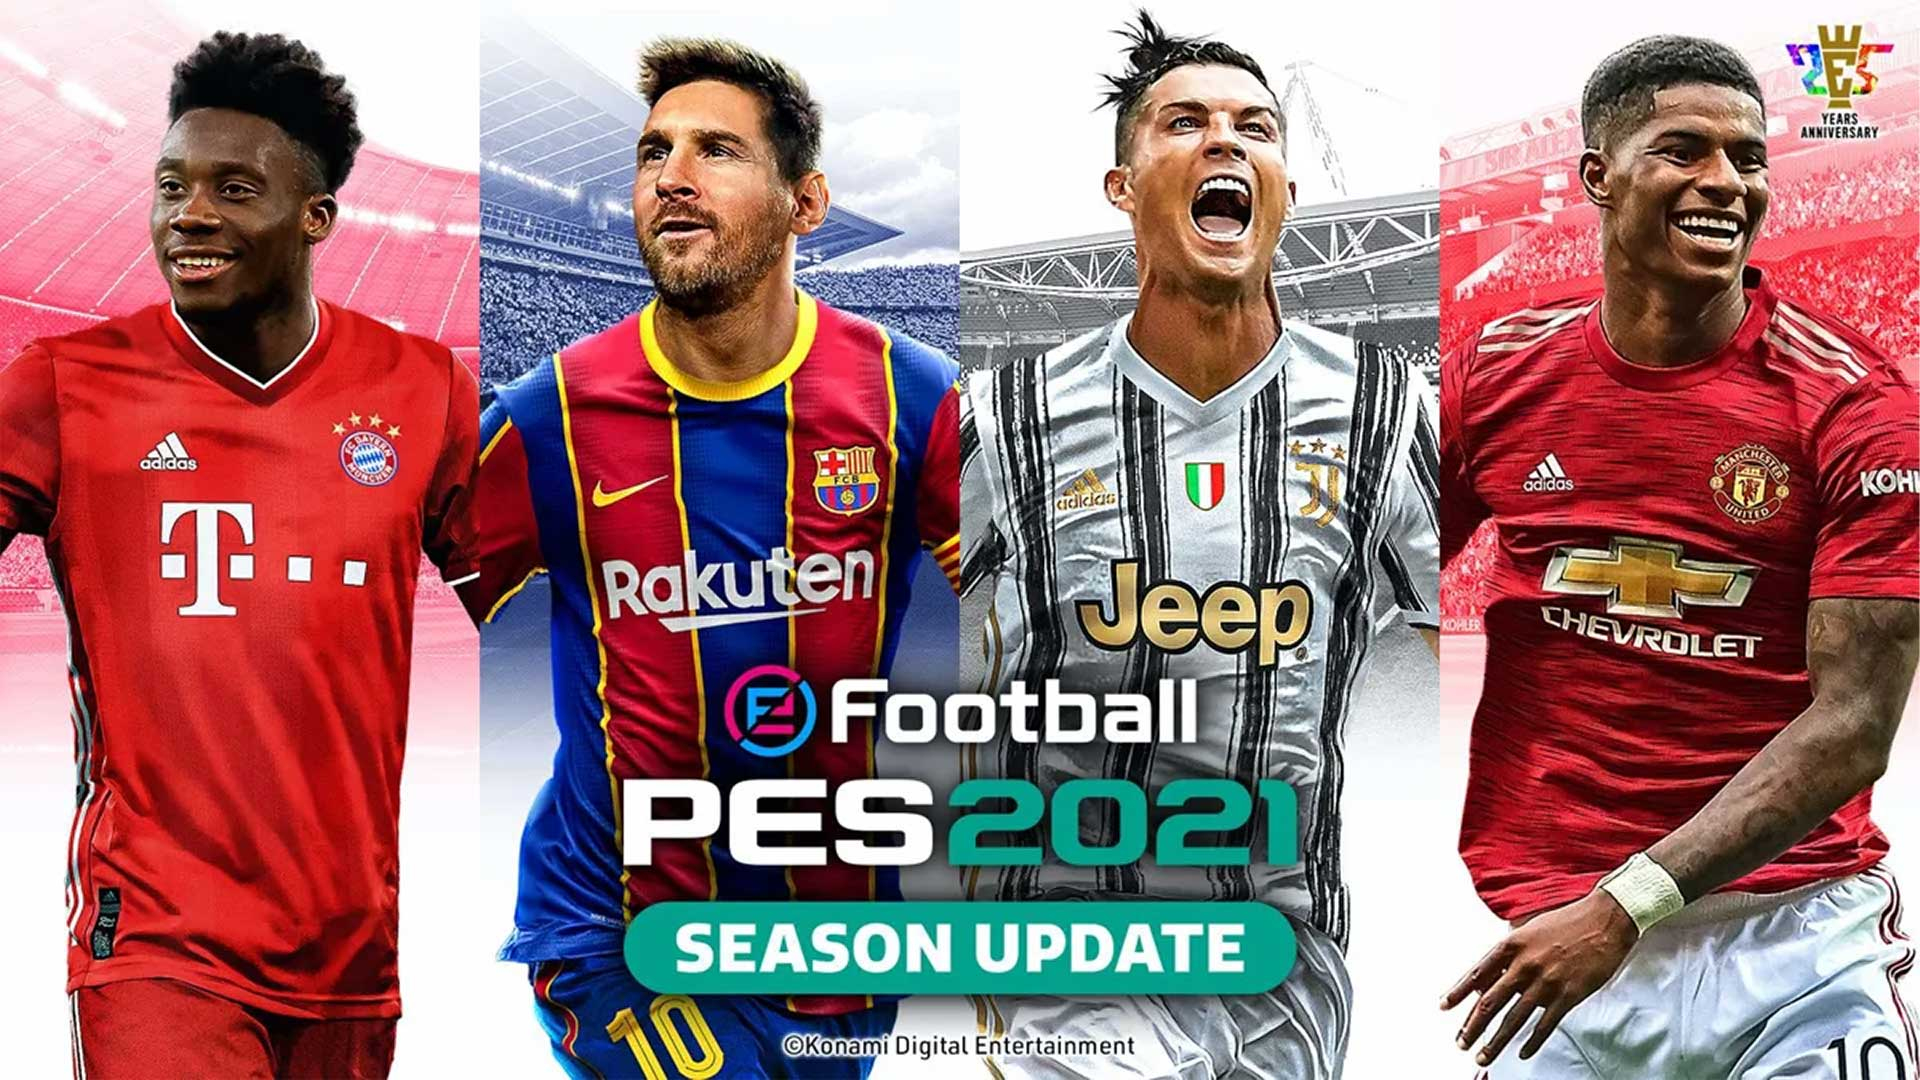 eFootball PES 2021 SEASON UPDATE cover